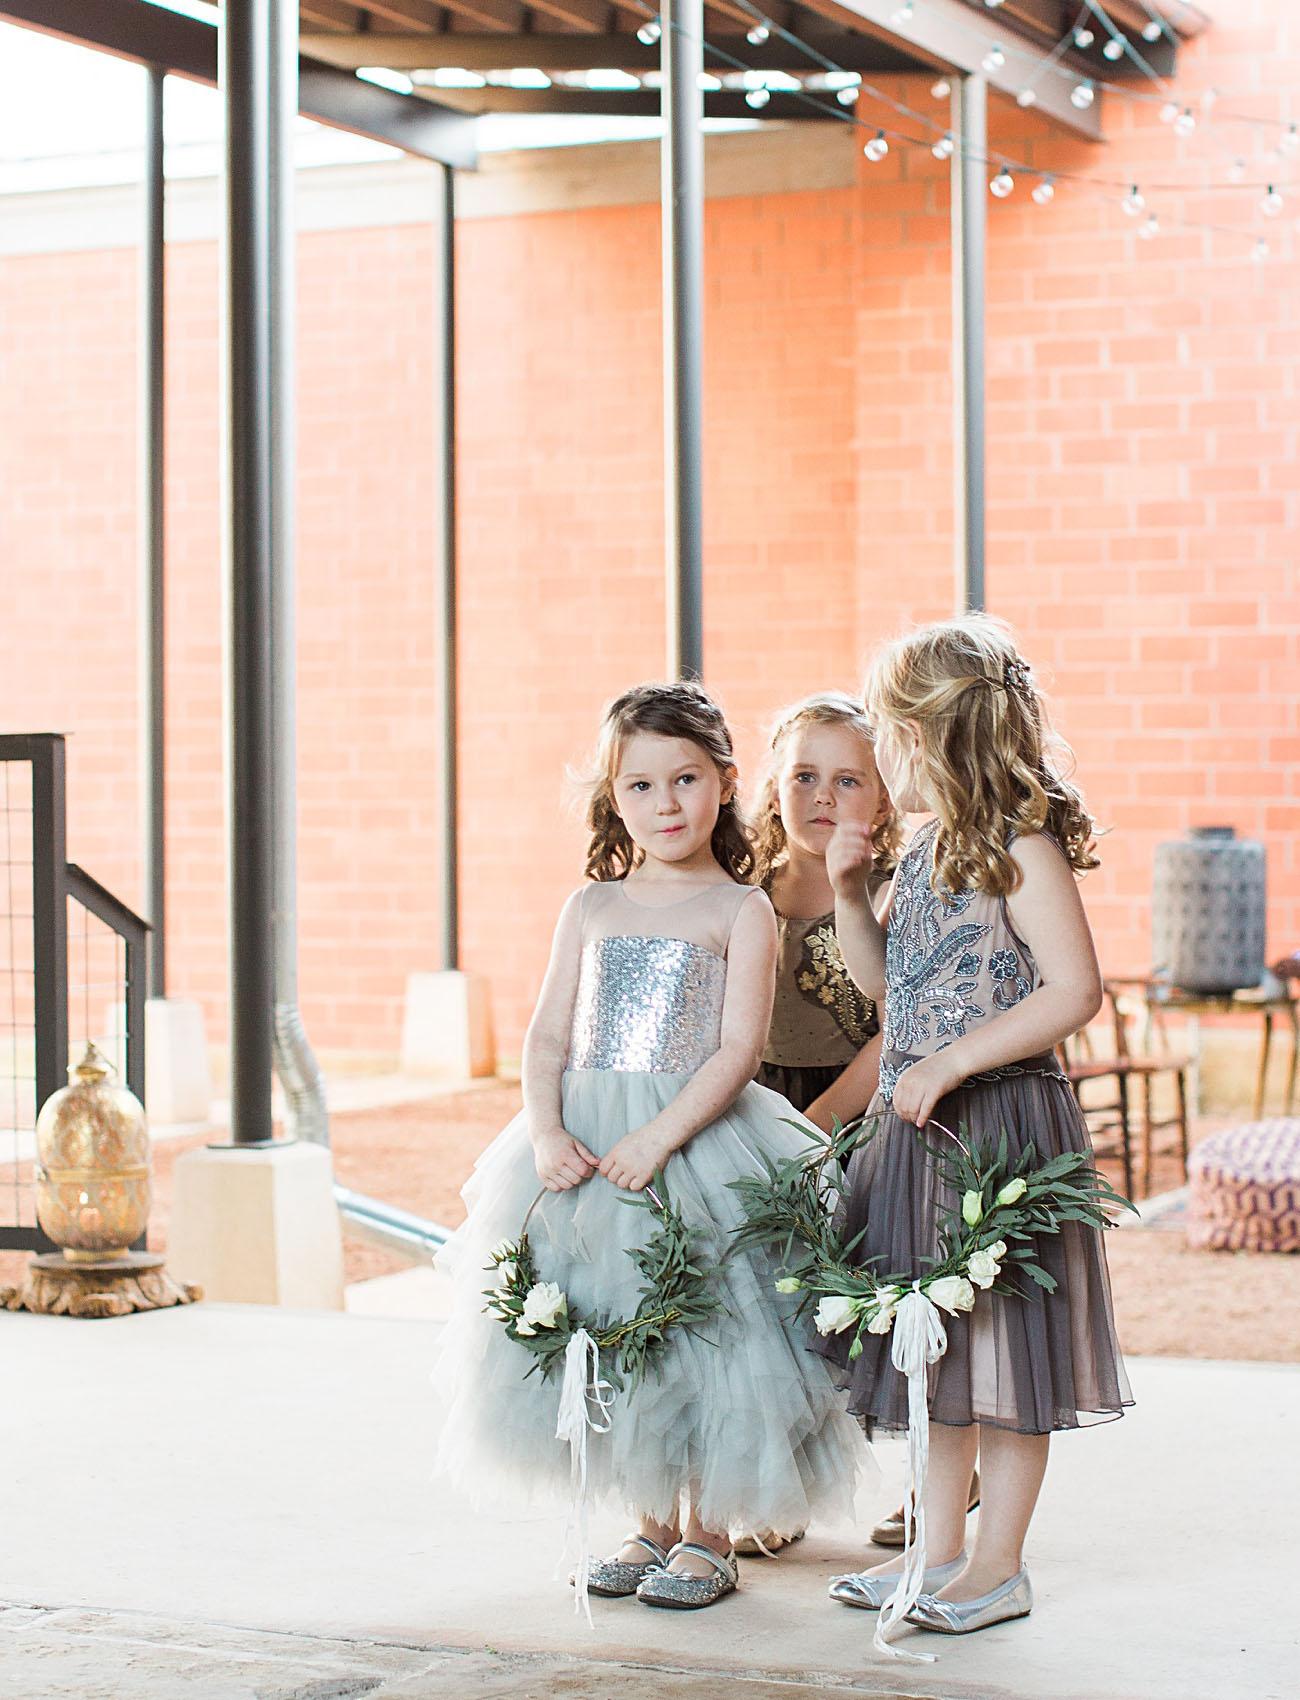 flower girls with wreaths